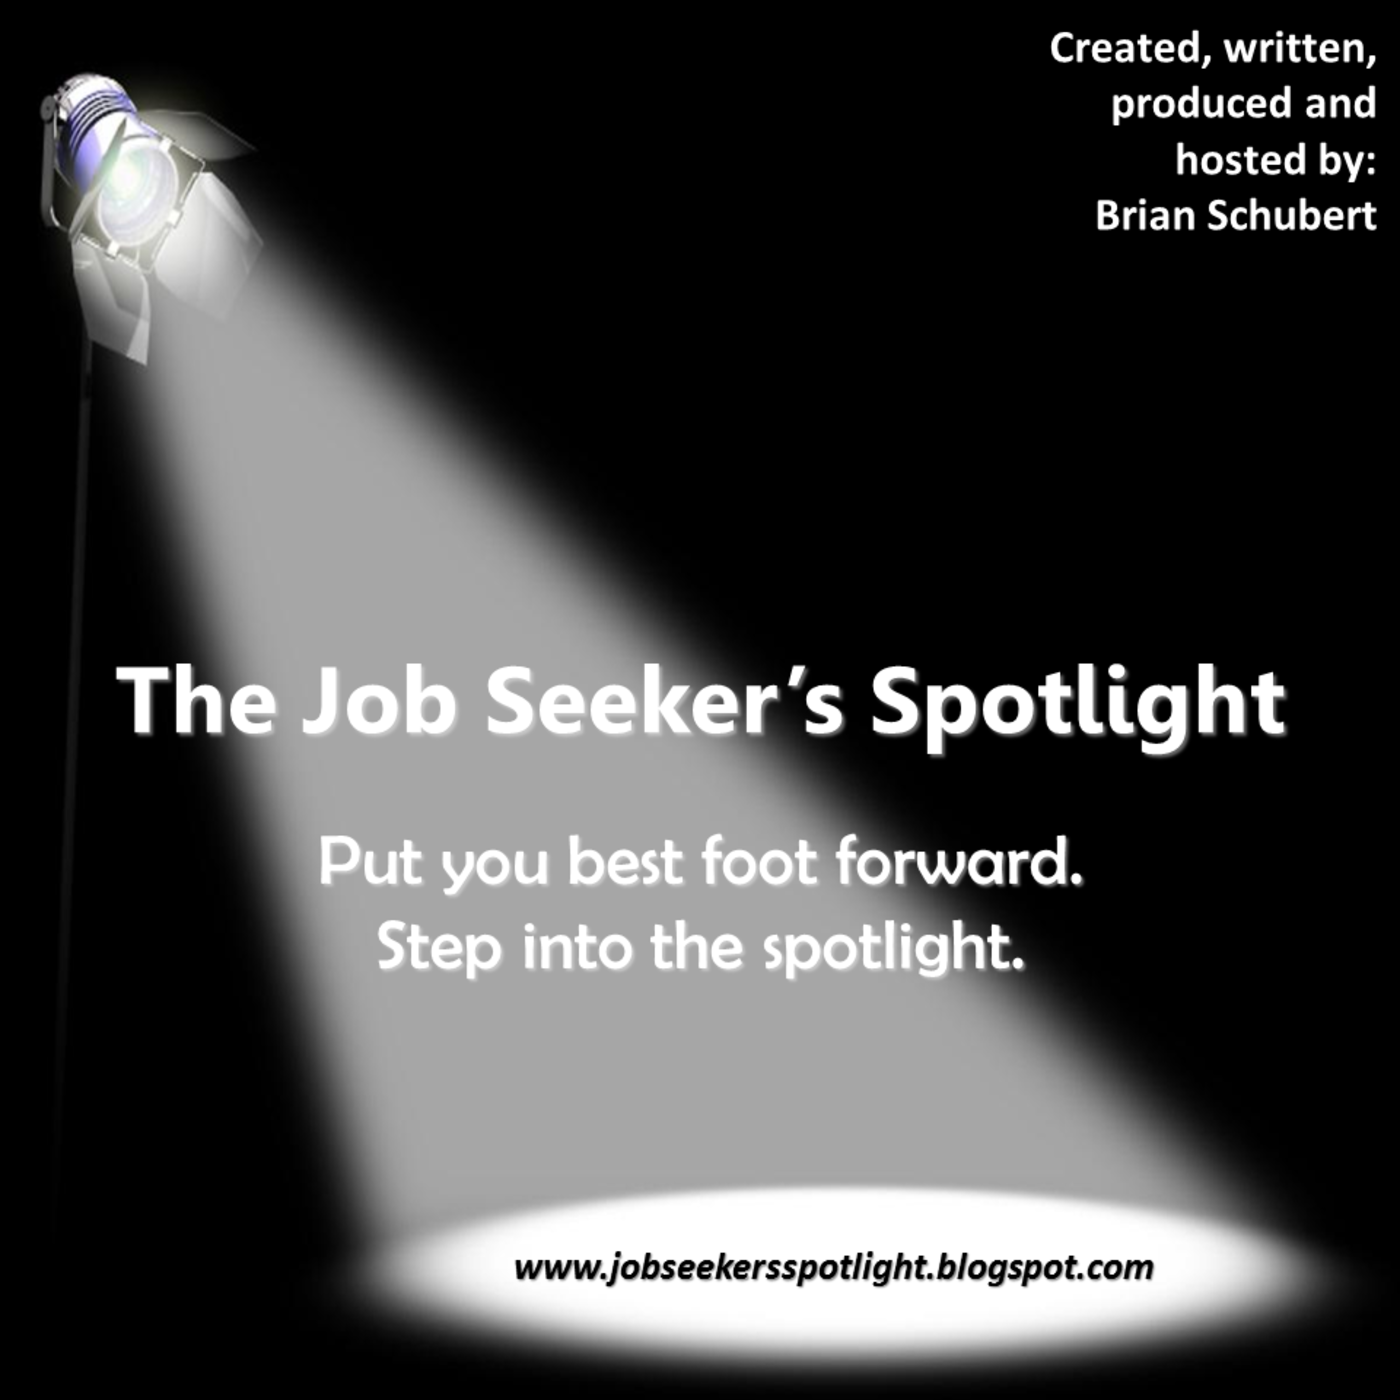 The Job Seeker's Spotlight